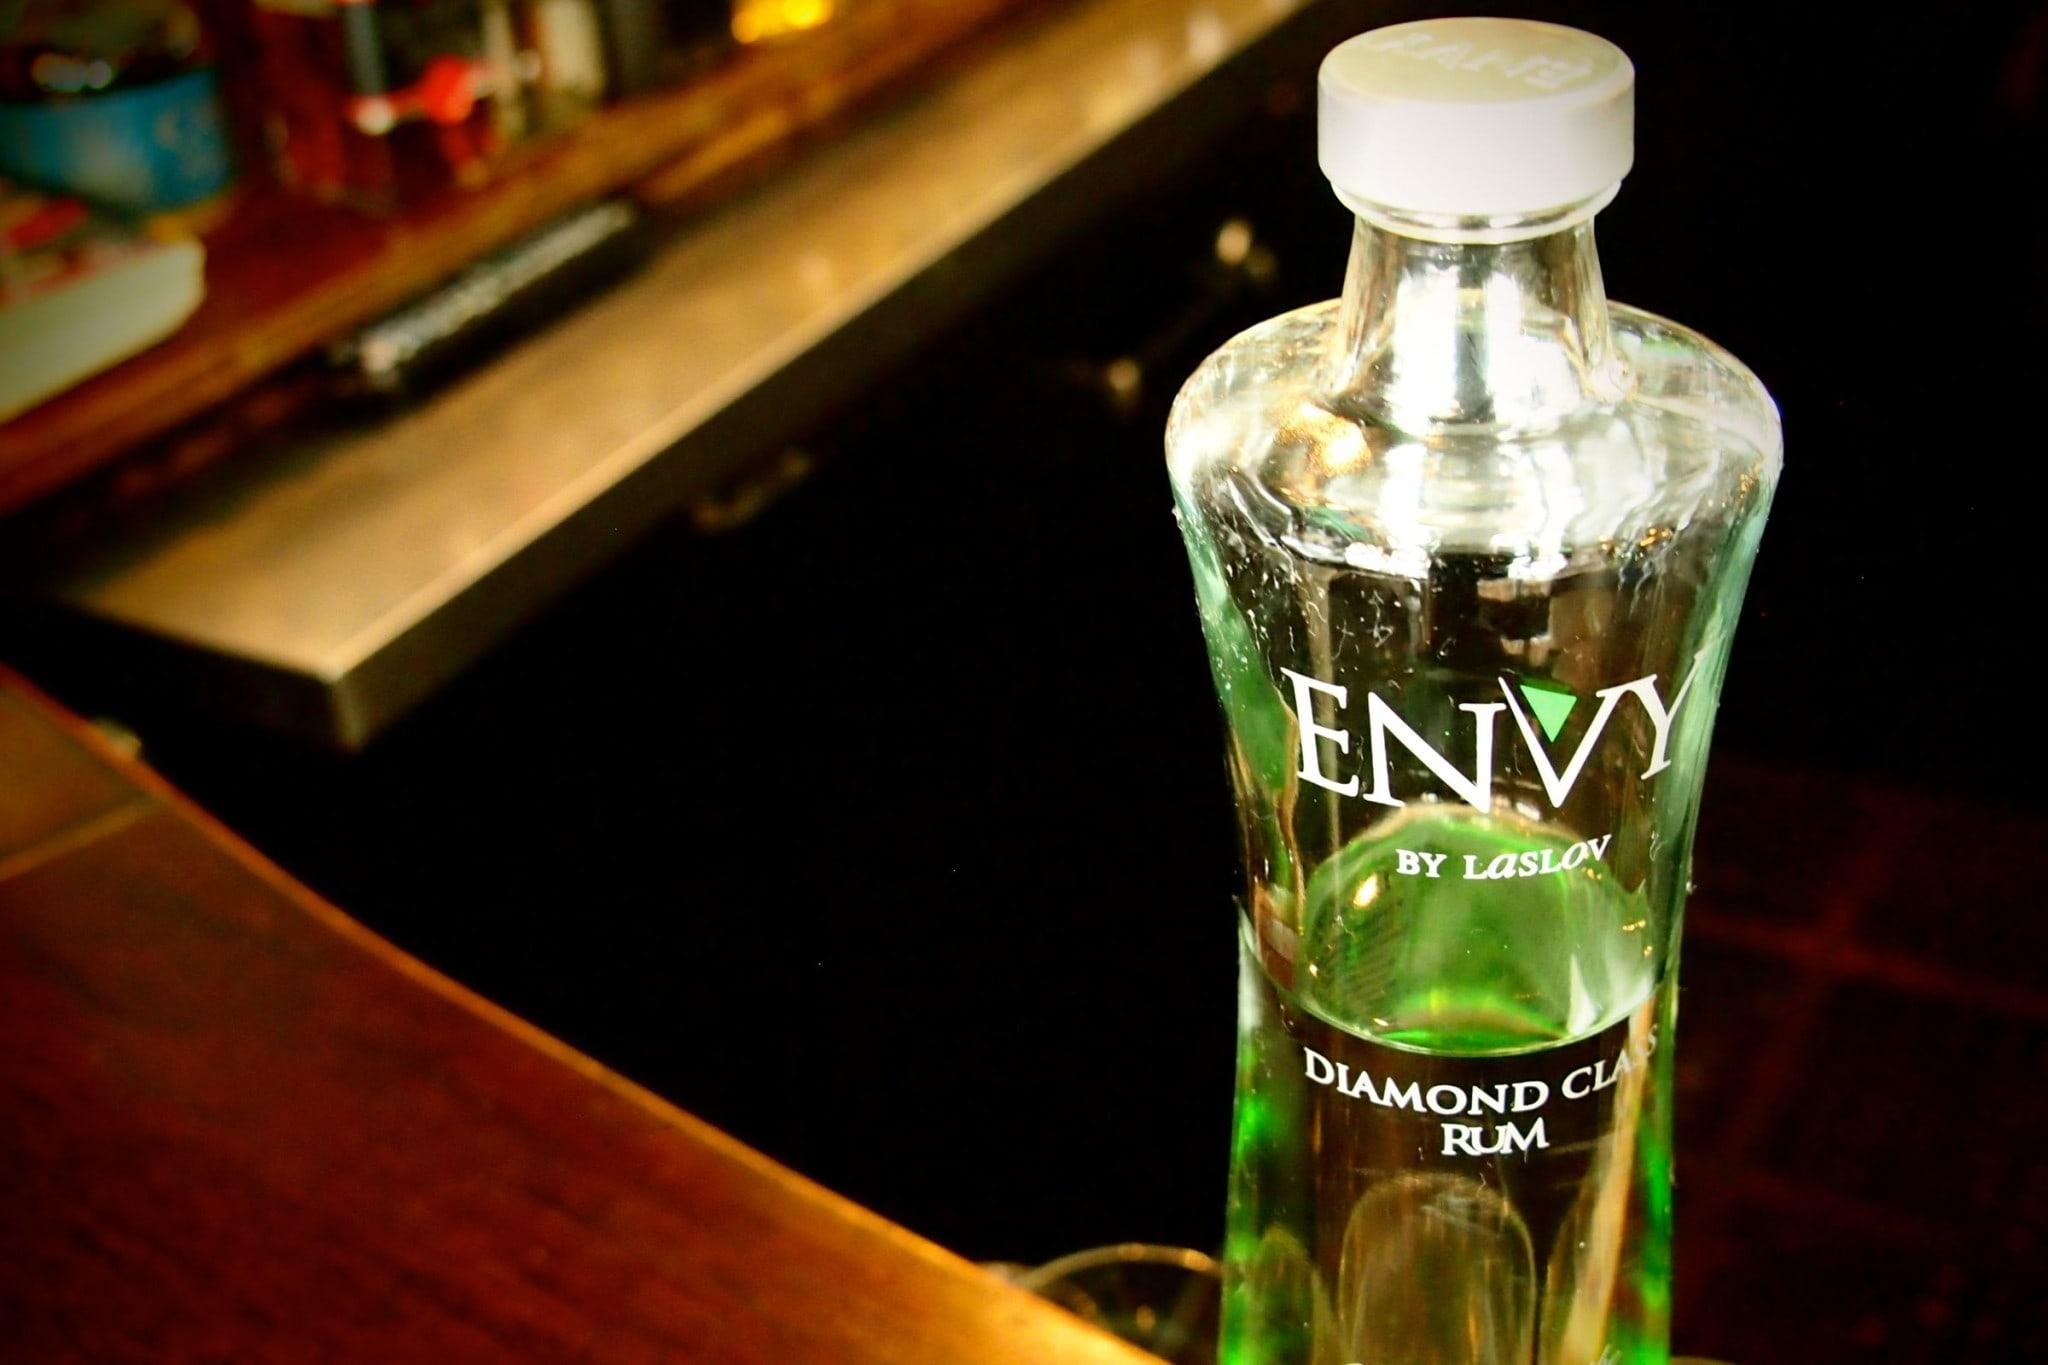 Blinded by Envy, Diamond Class Rum de Mexico